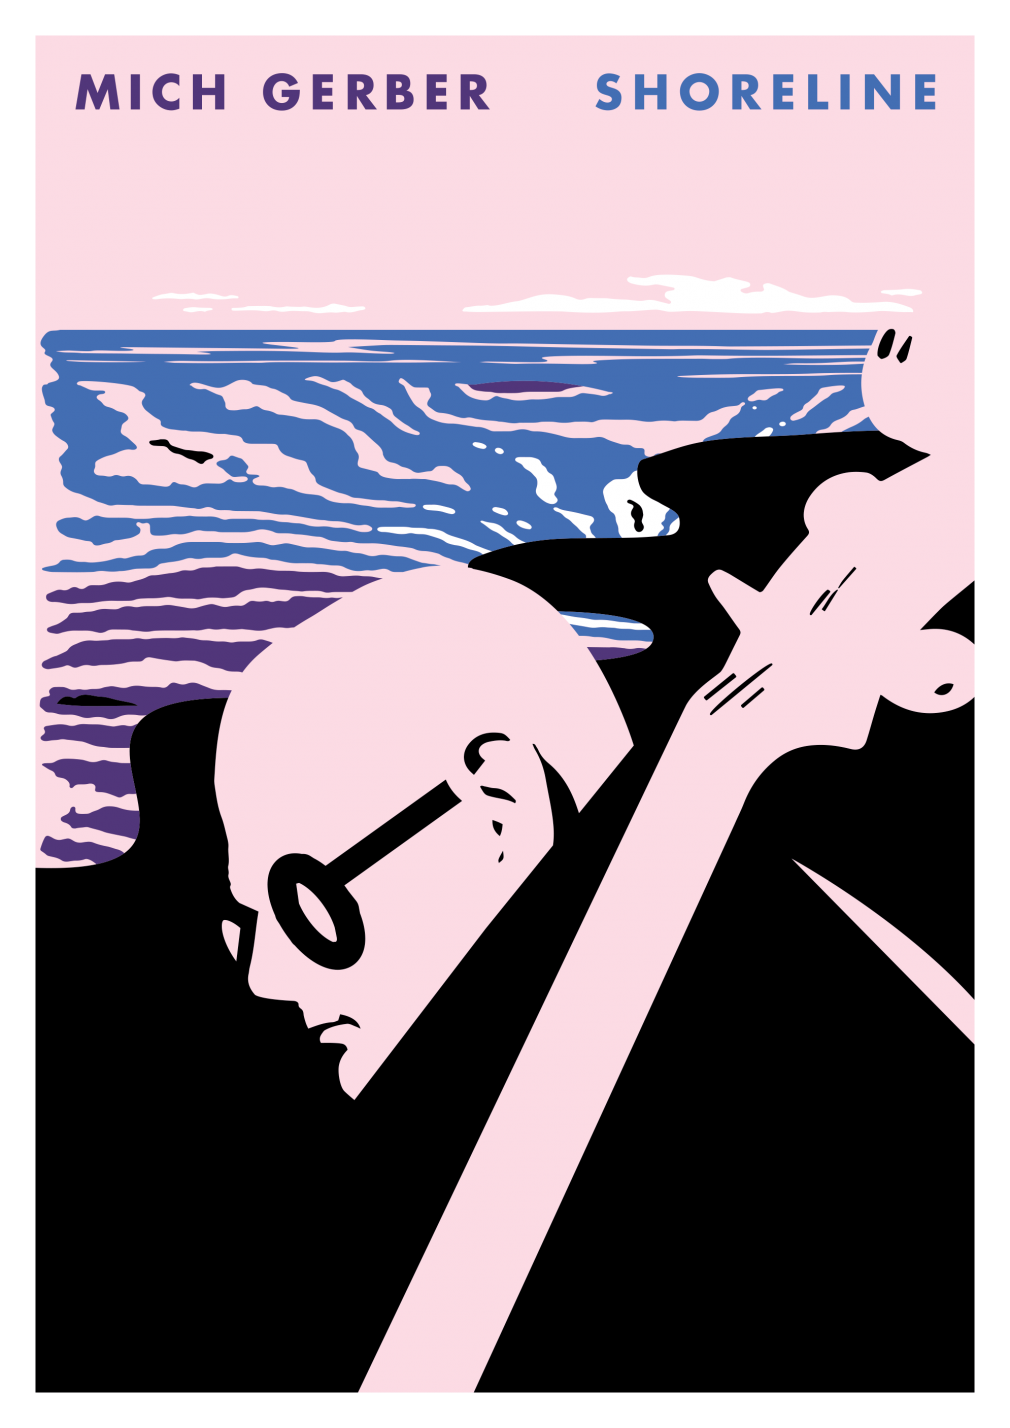 Mich Gerber Shoreline Poster